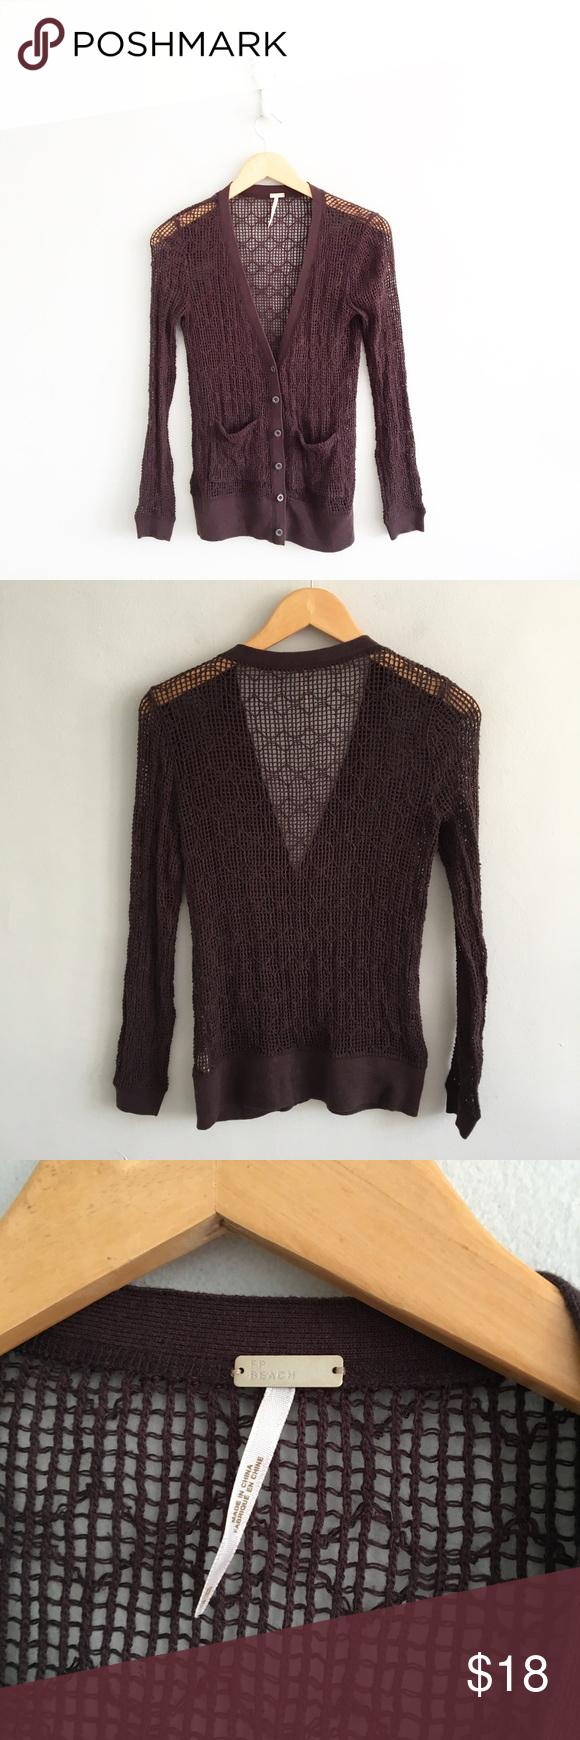 Free People Brown Open Knit Cardigan Sweater | Free people, Brown ...